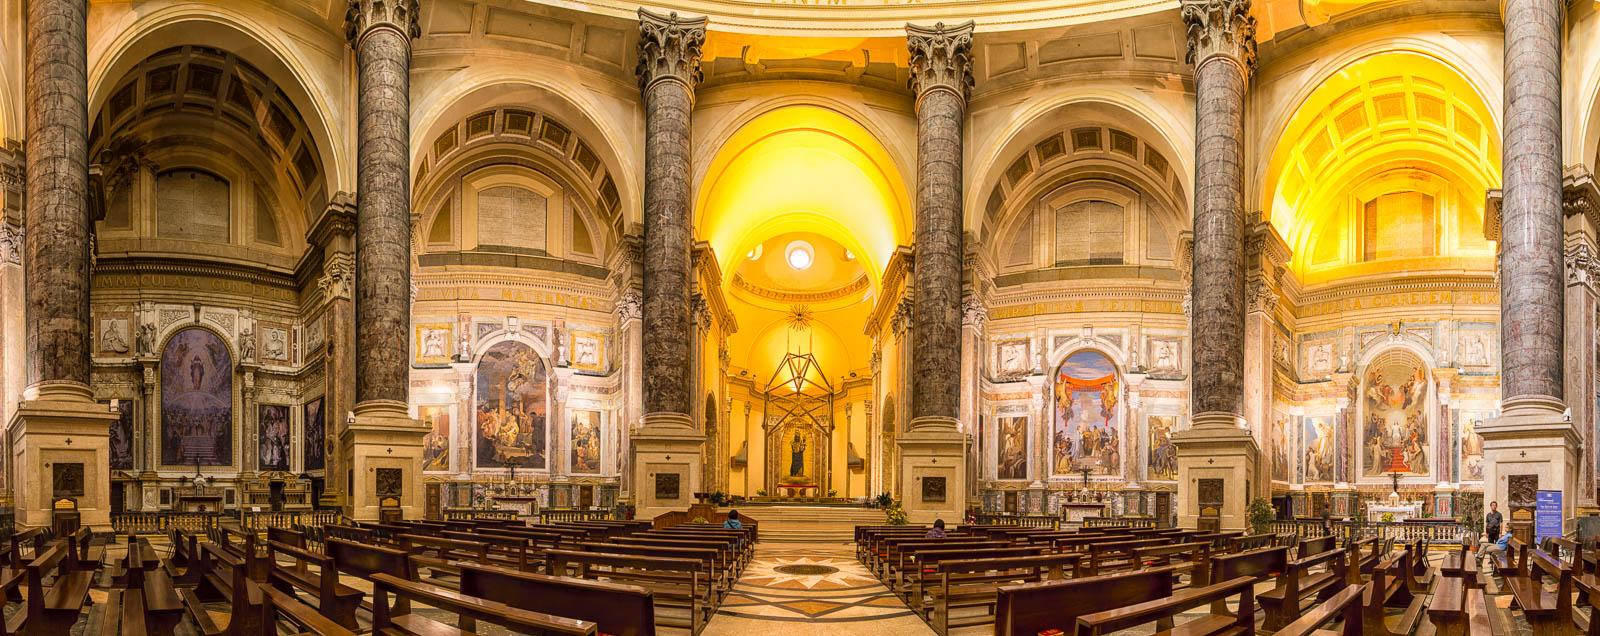 Neue Basilika auf dem Sacro Monte di Varallo